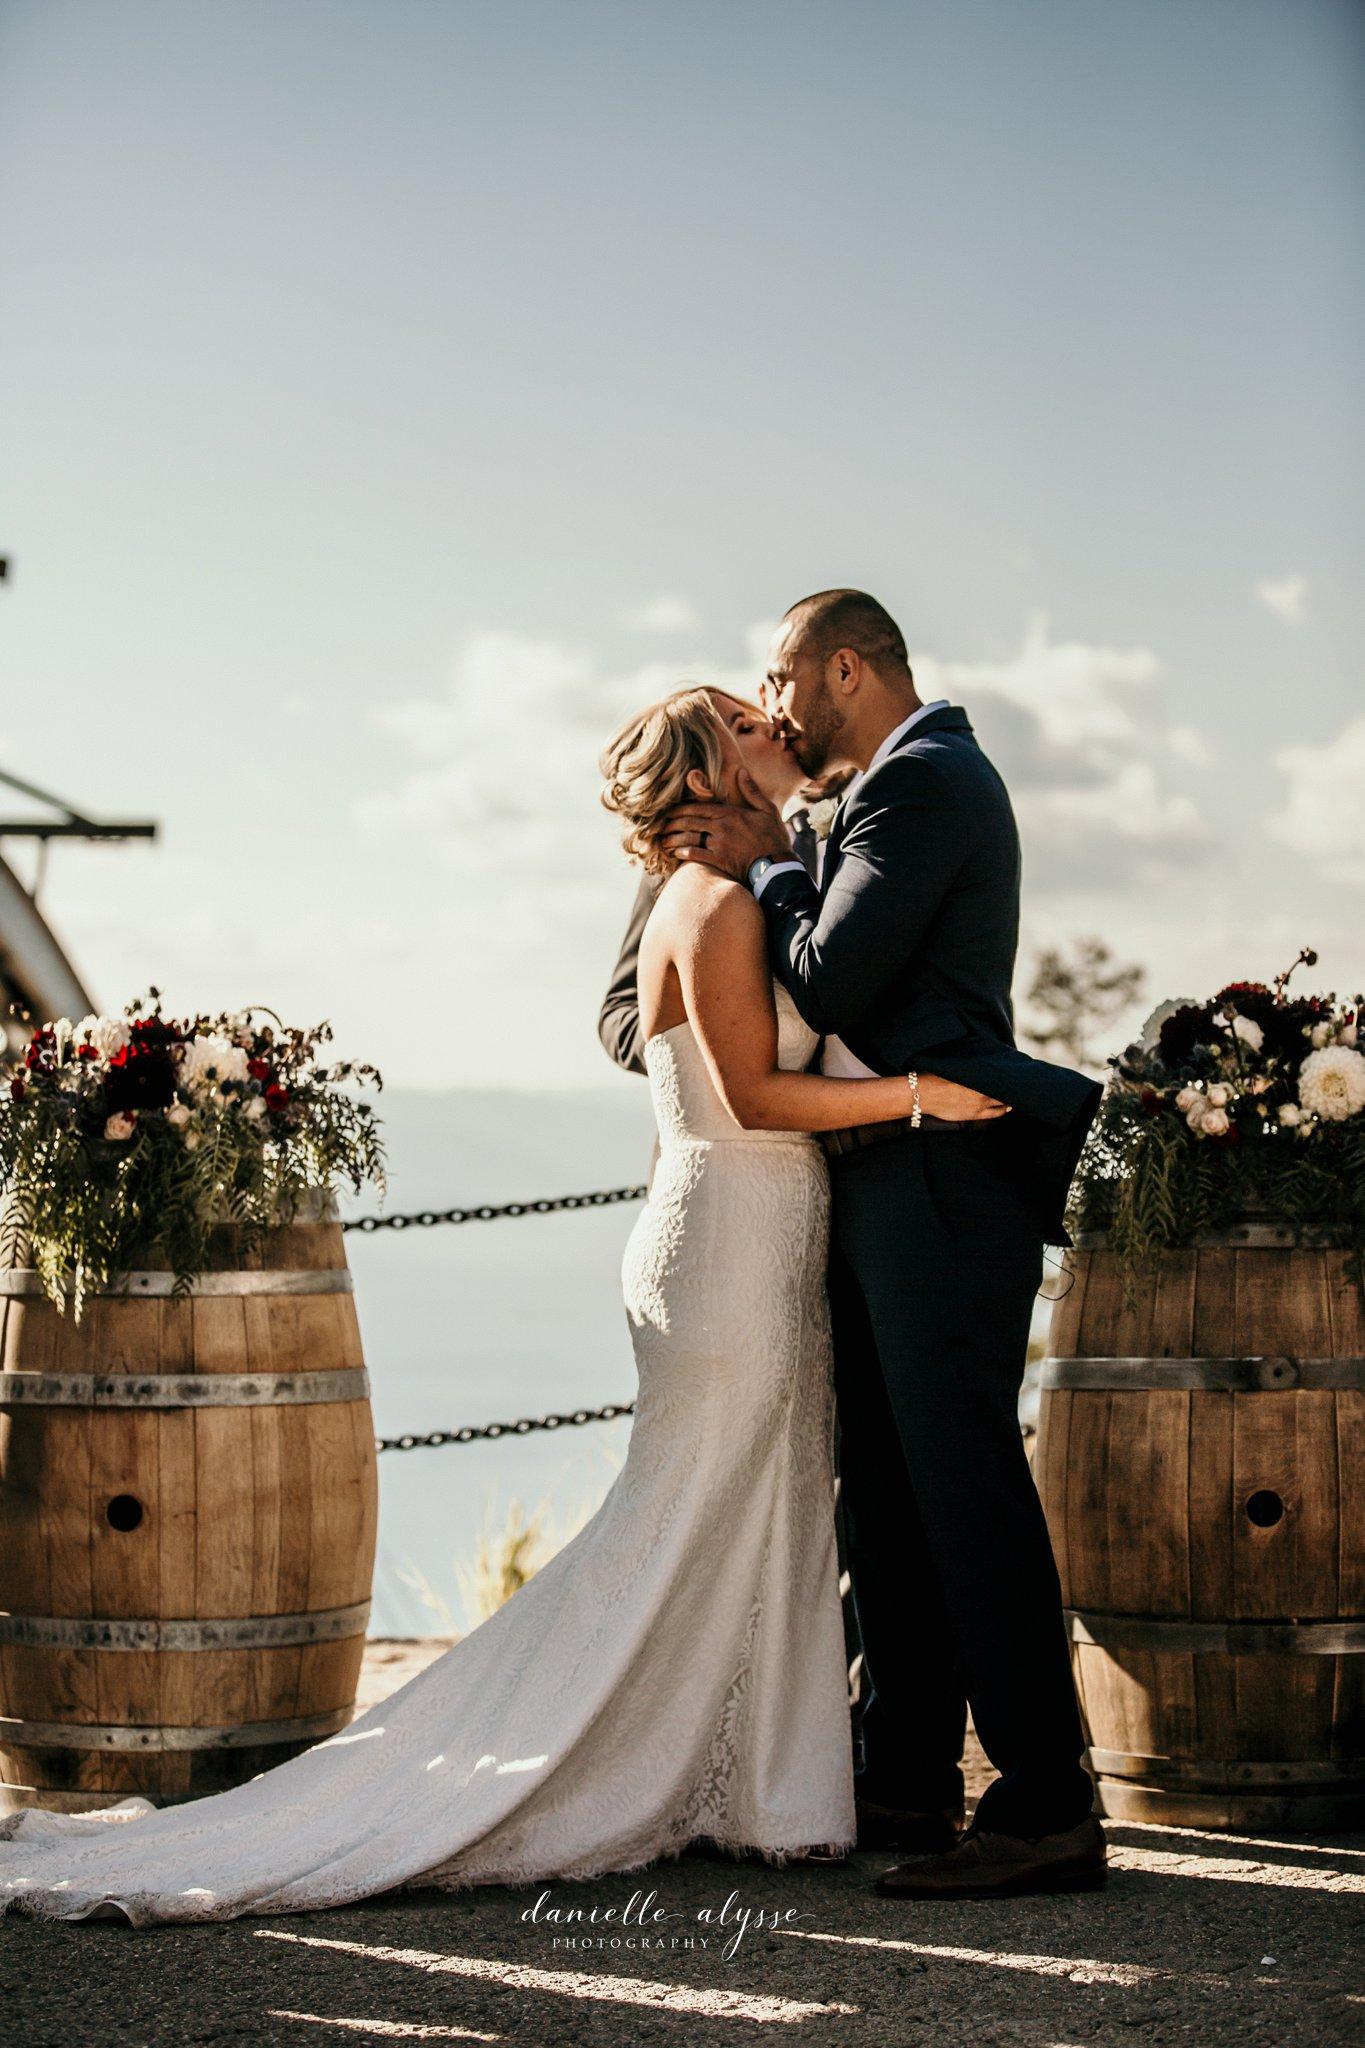 180831_wedding_stephanie_heavenly_south_lake_tahoe_danielle_alysse_photography_destination_blog_735_WEB.jpg